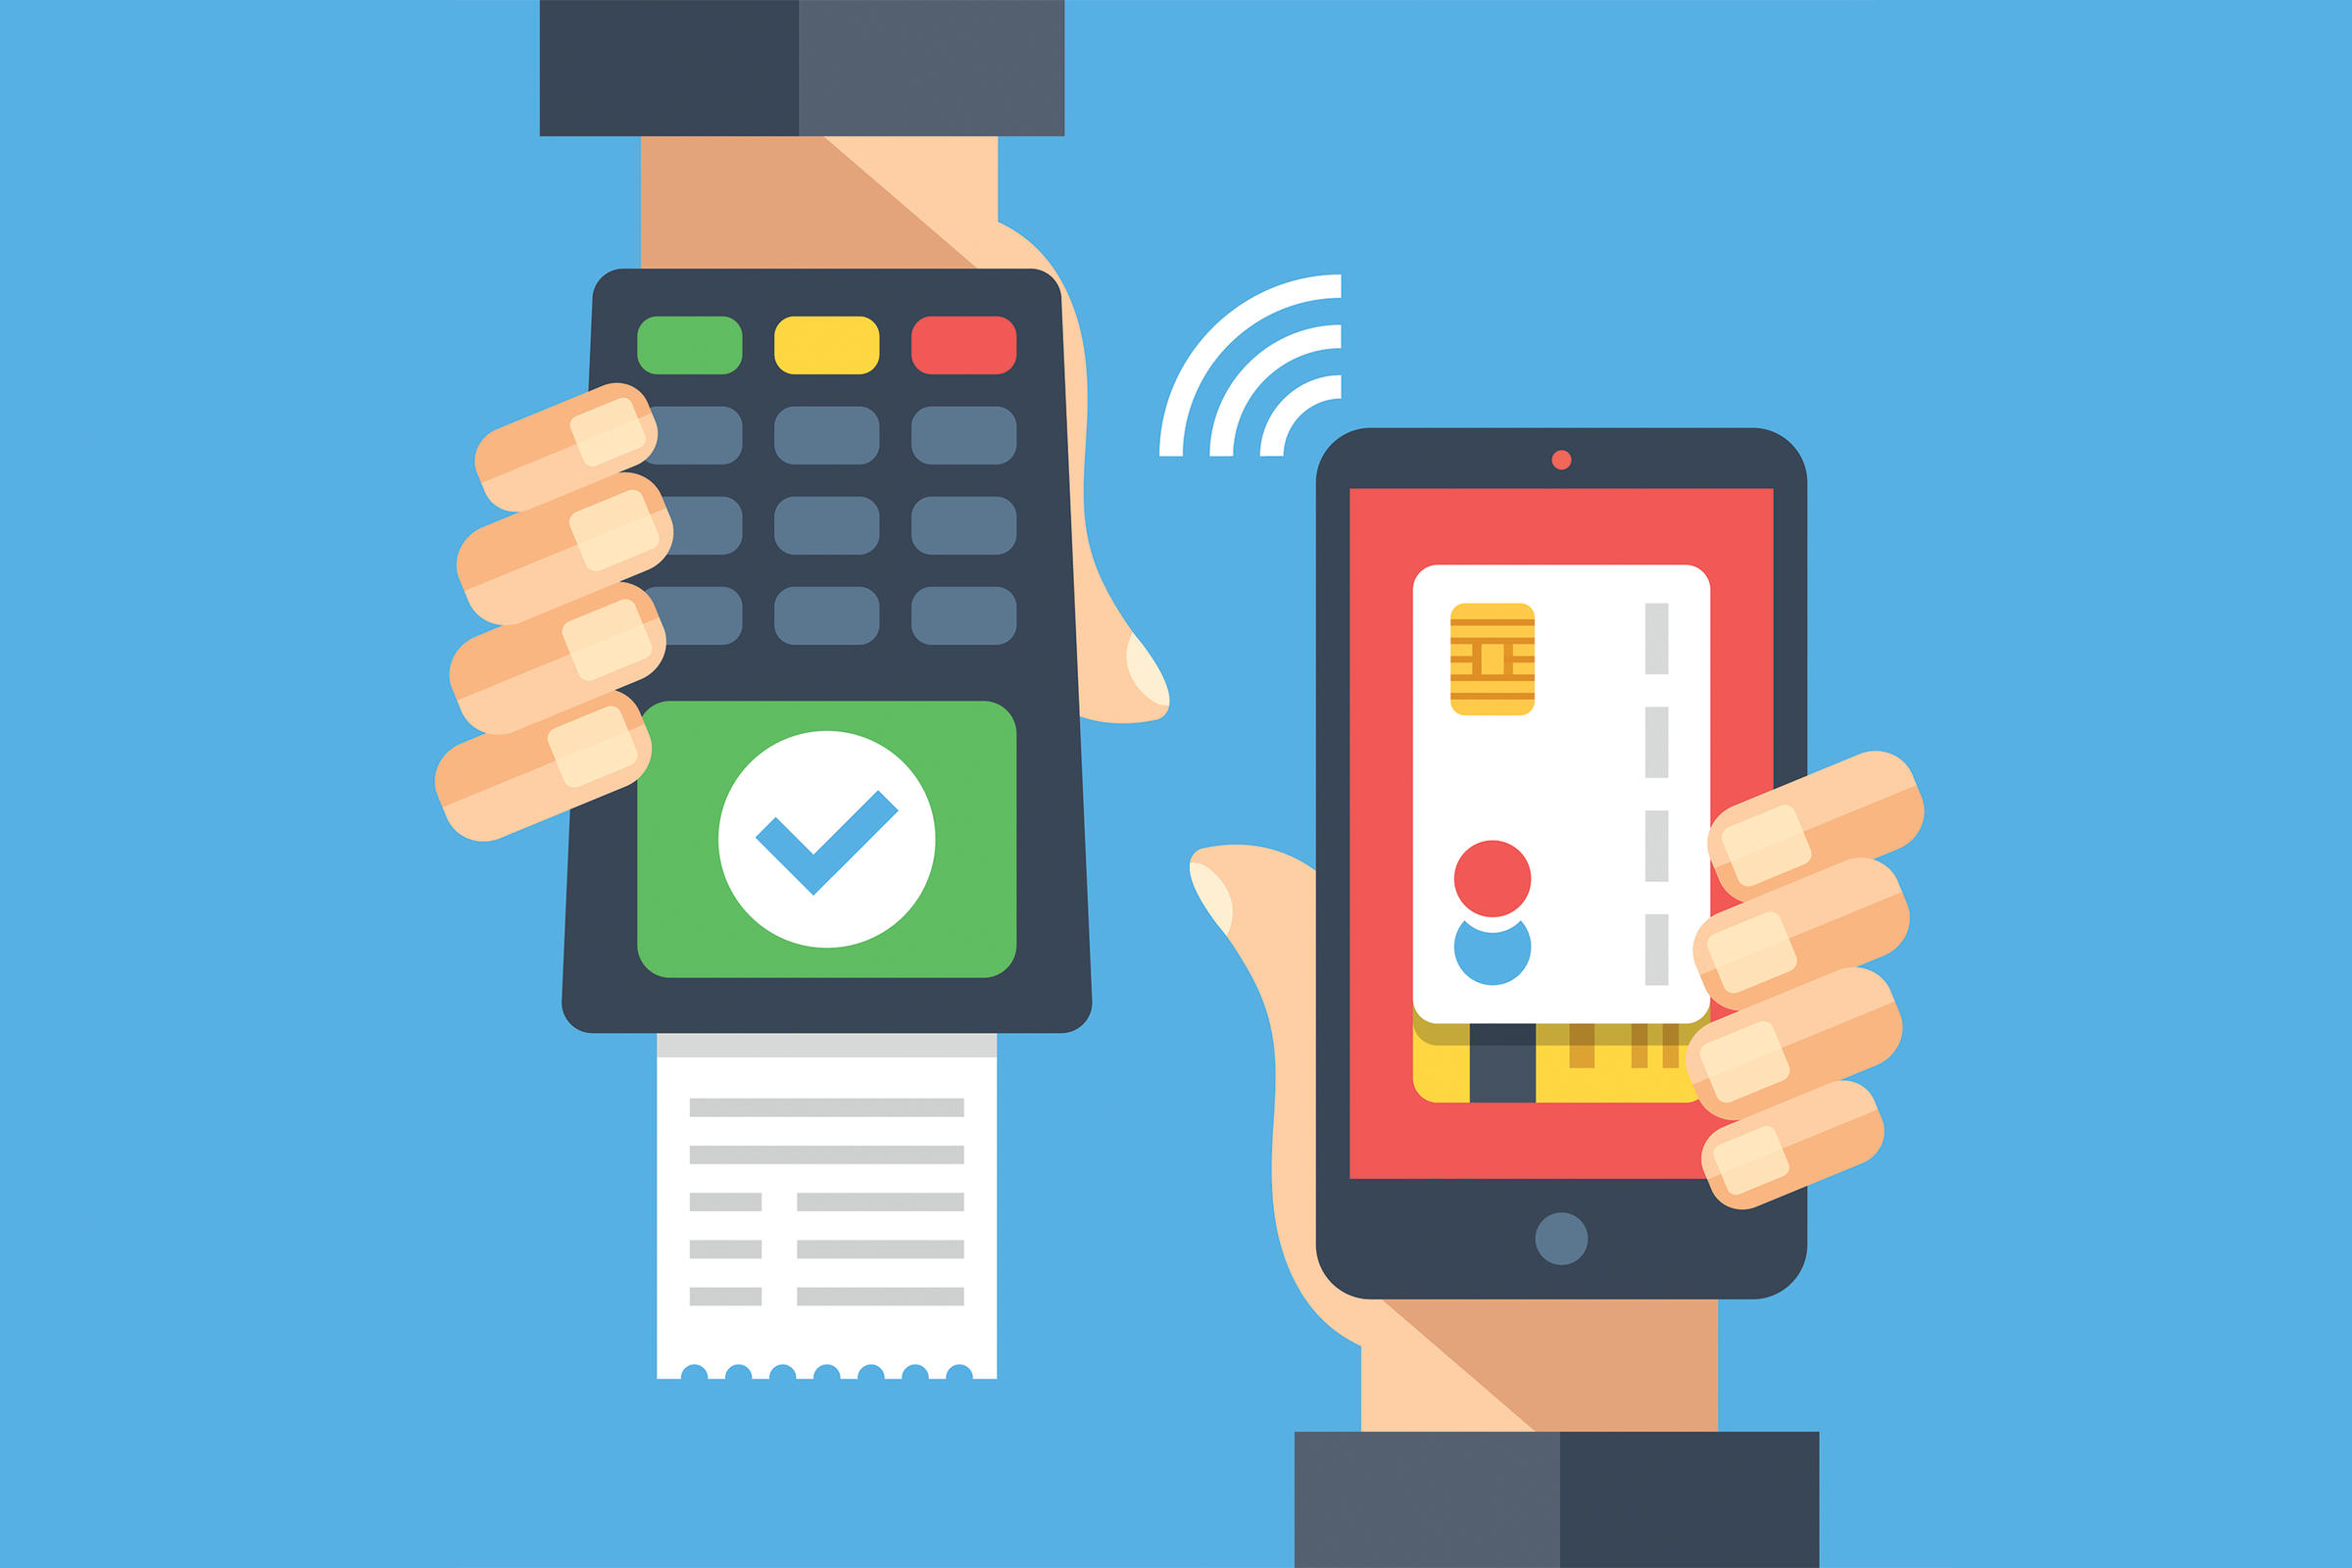 Brazilian 'unicorn' Ebanx launches digital wallets